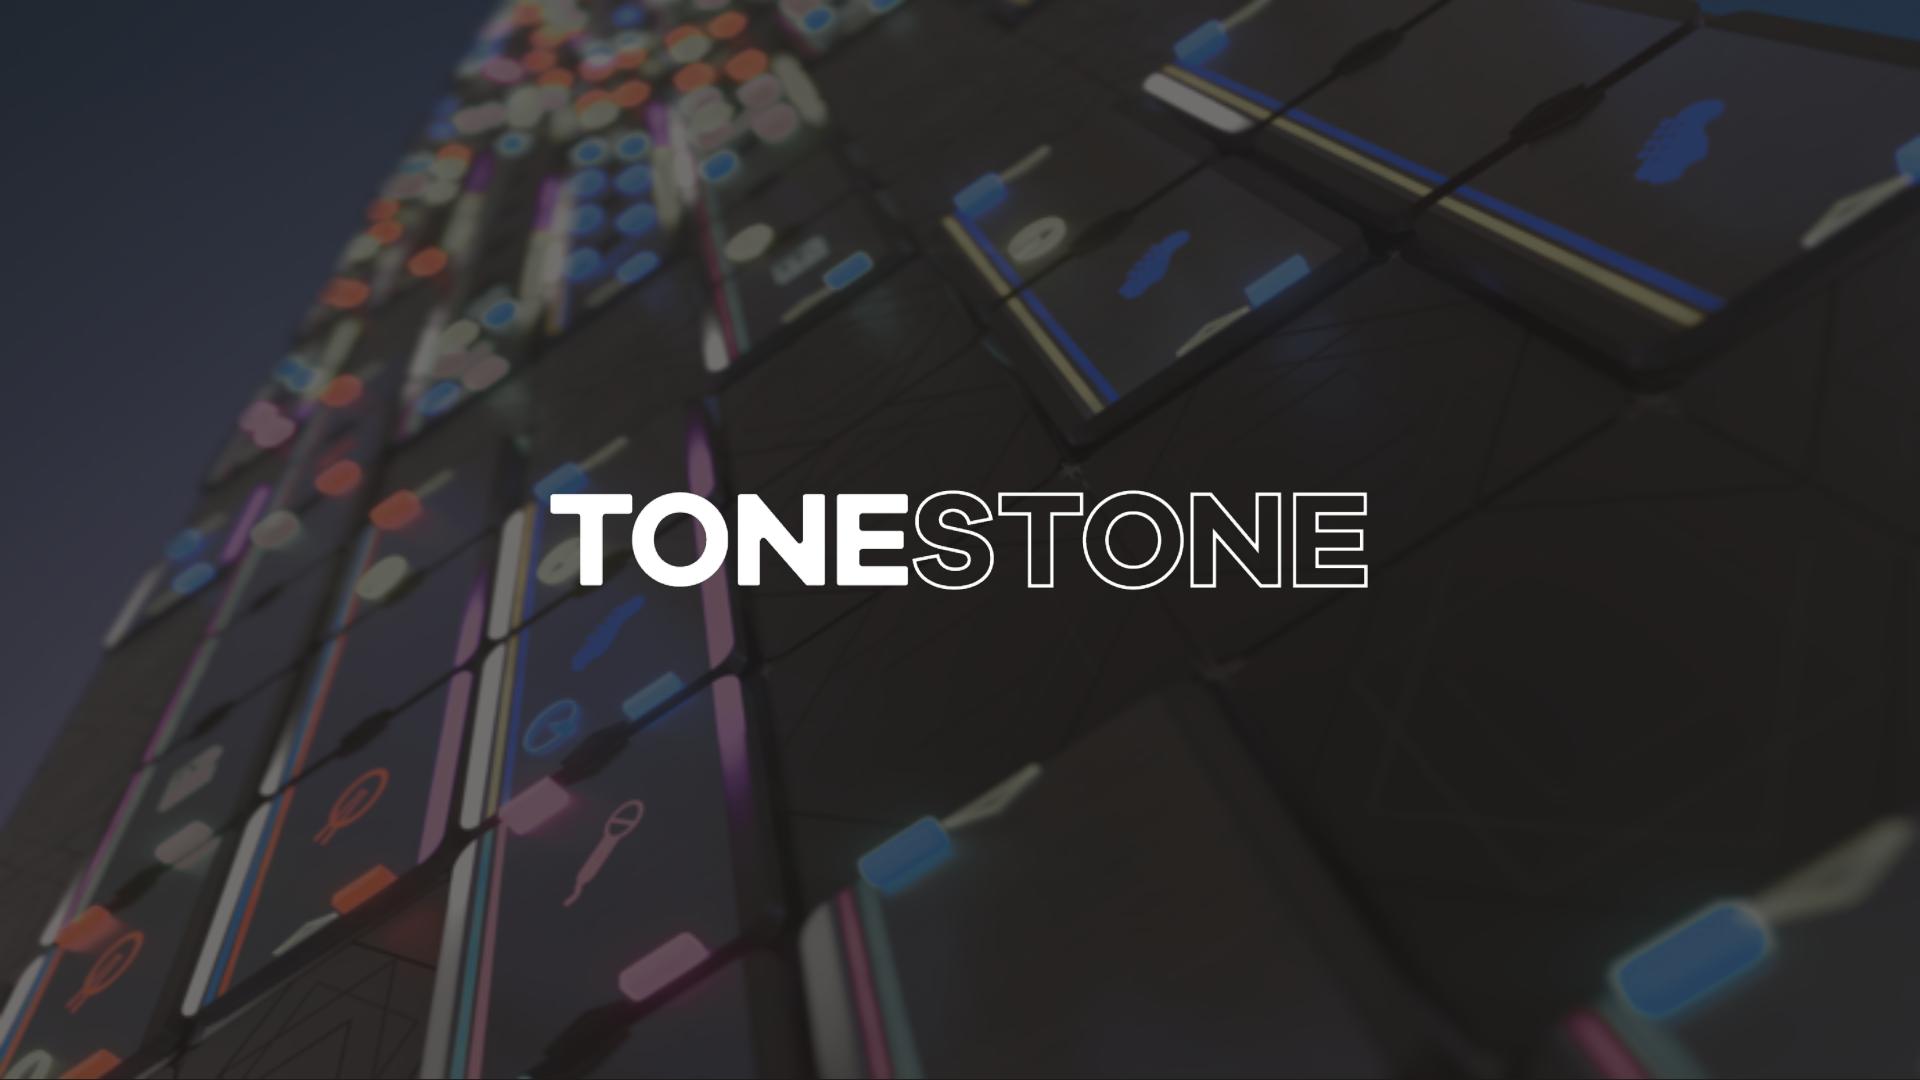 Tonestone splash